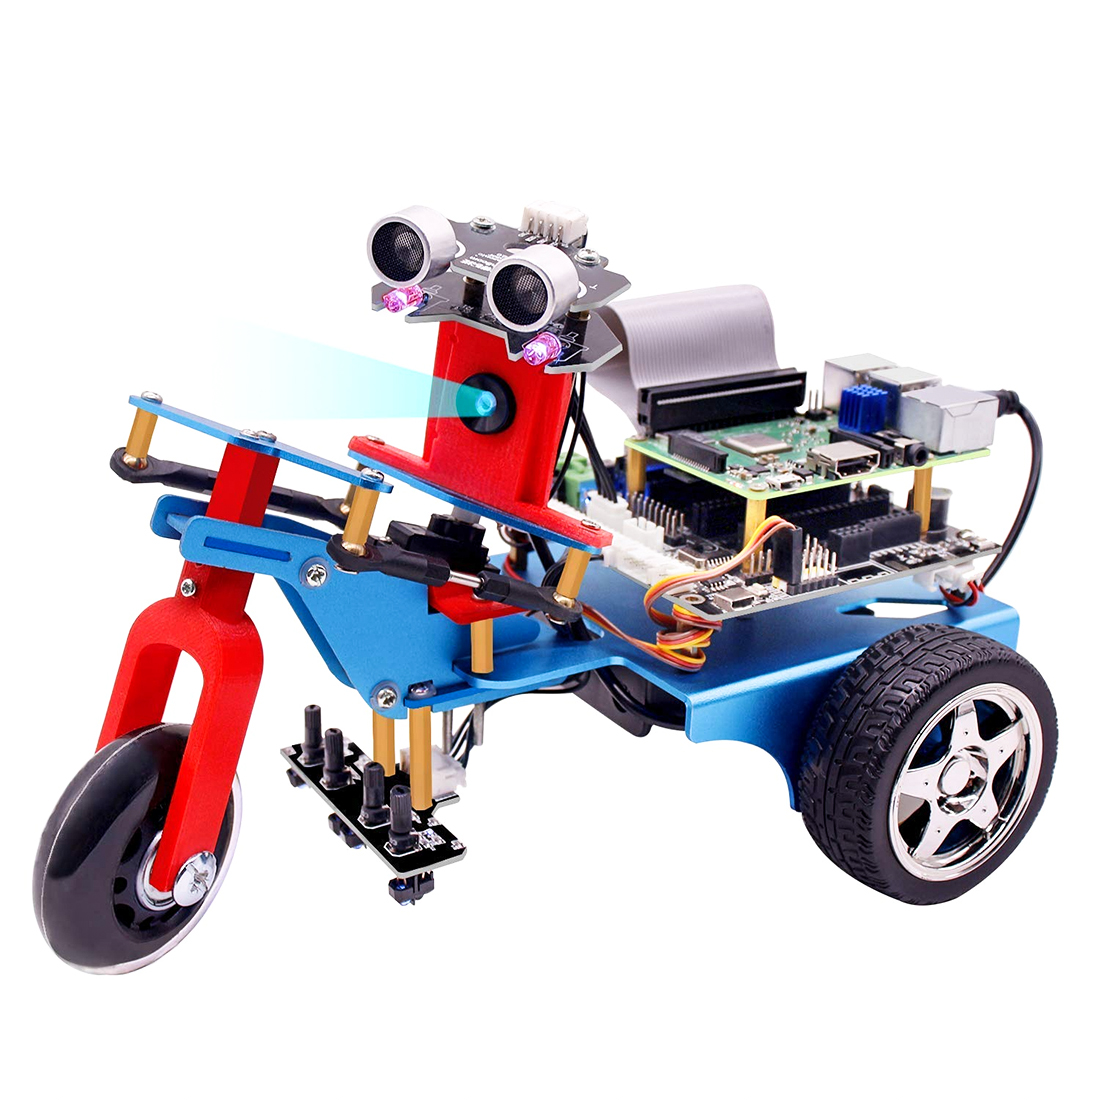 Three-Wheeled Car Shape Smart Robot Car Kit DIY Programmable Robot Kit For Raspberry4/1G(Including:Raspberry Pi)(Pi Not Include)